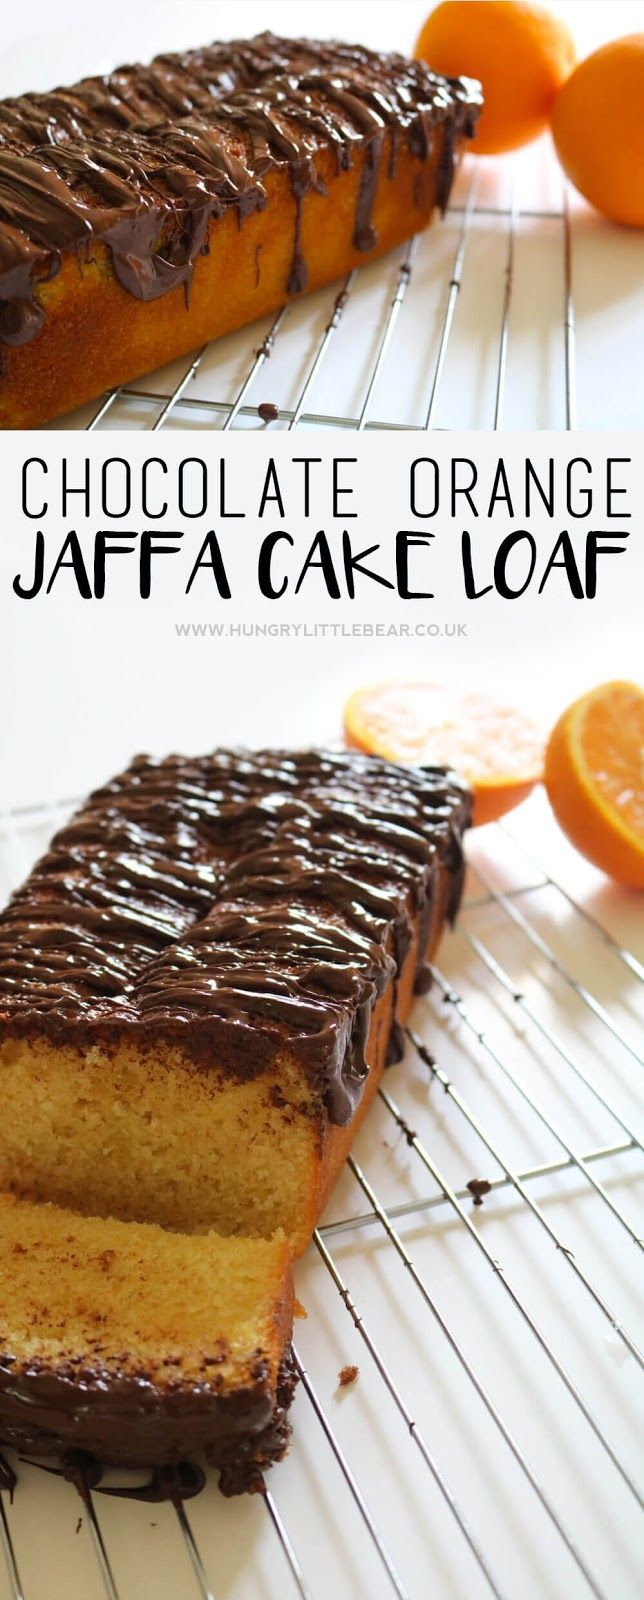 Chocolate Orange Jaffa Cake Loaf   Hungry Little Bear